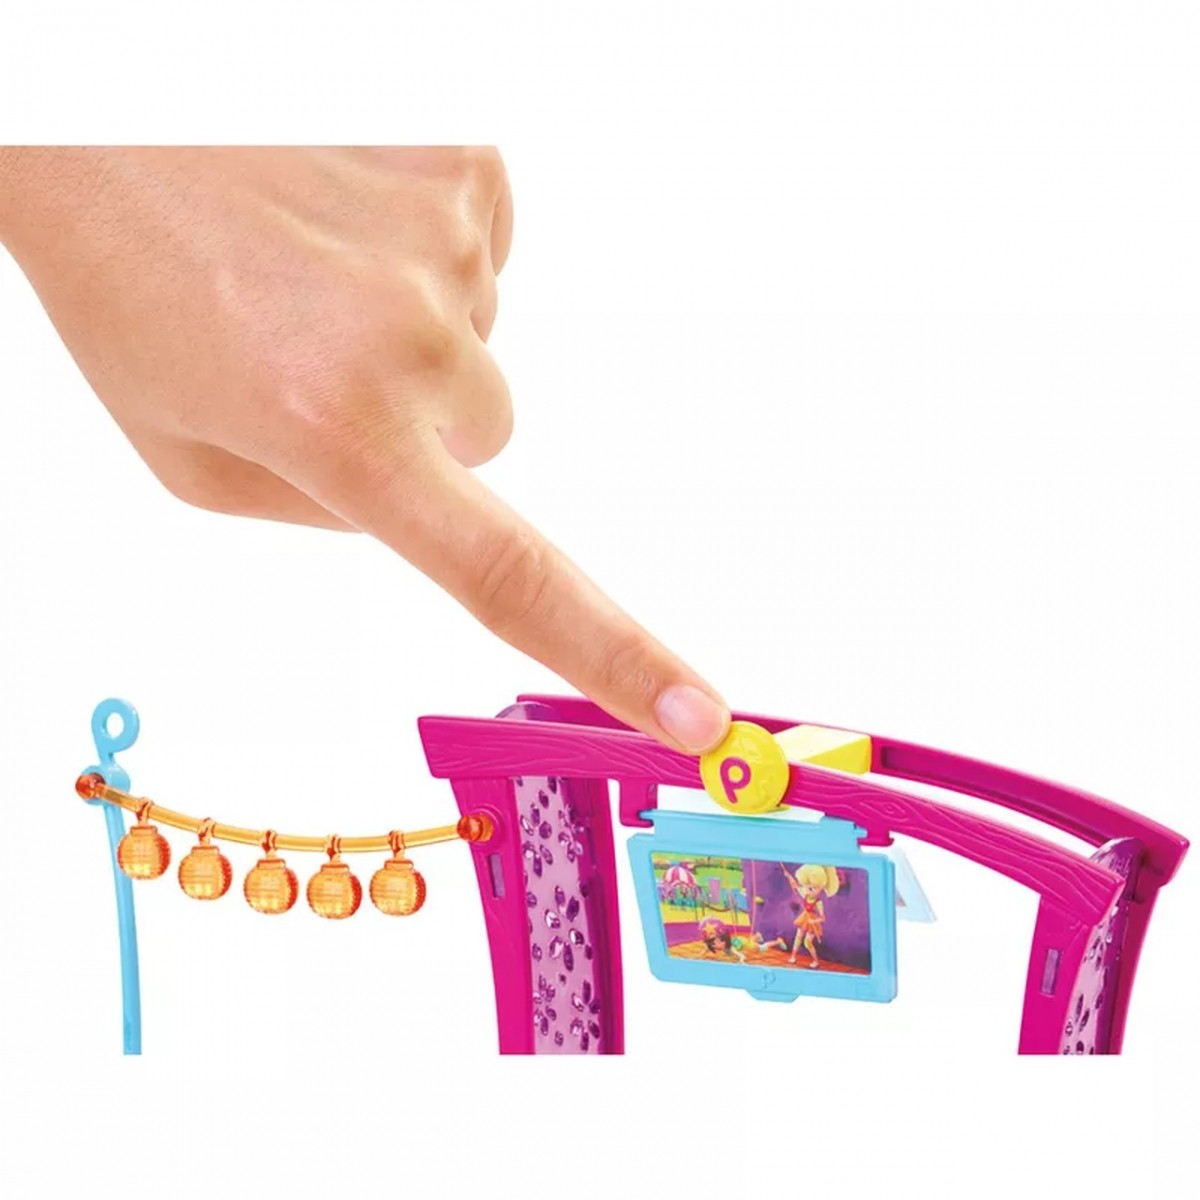 Boneca Polly com Playset: Churrasco Divertido Polly Pocket